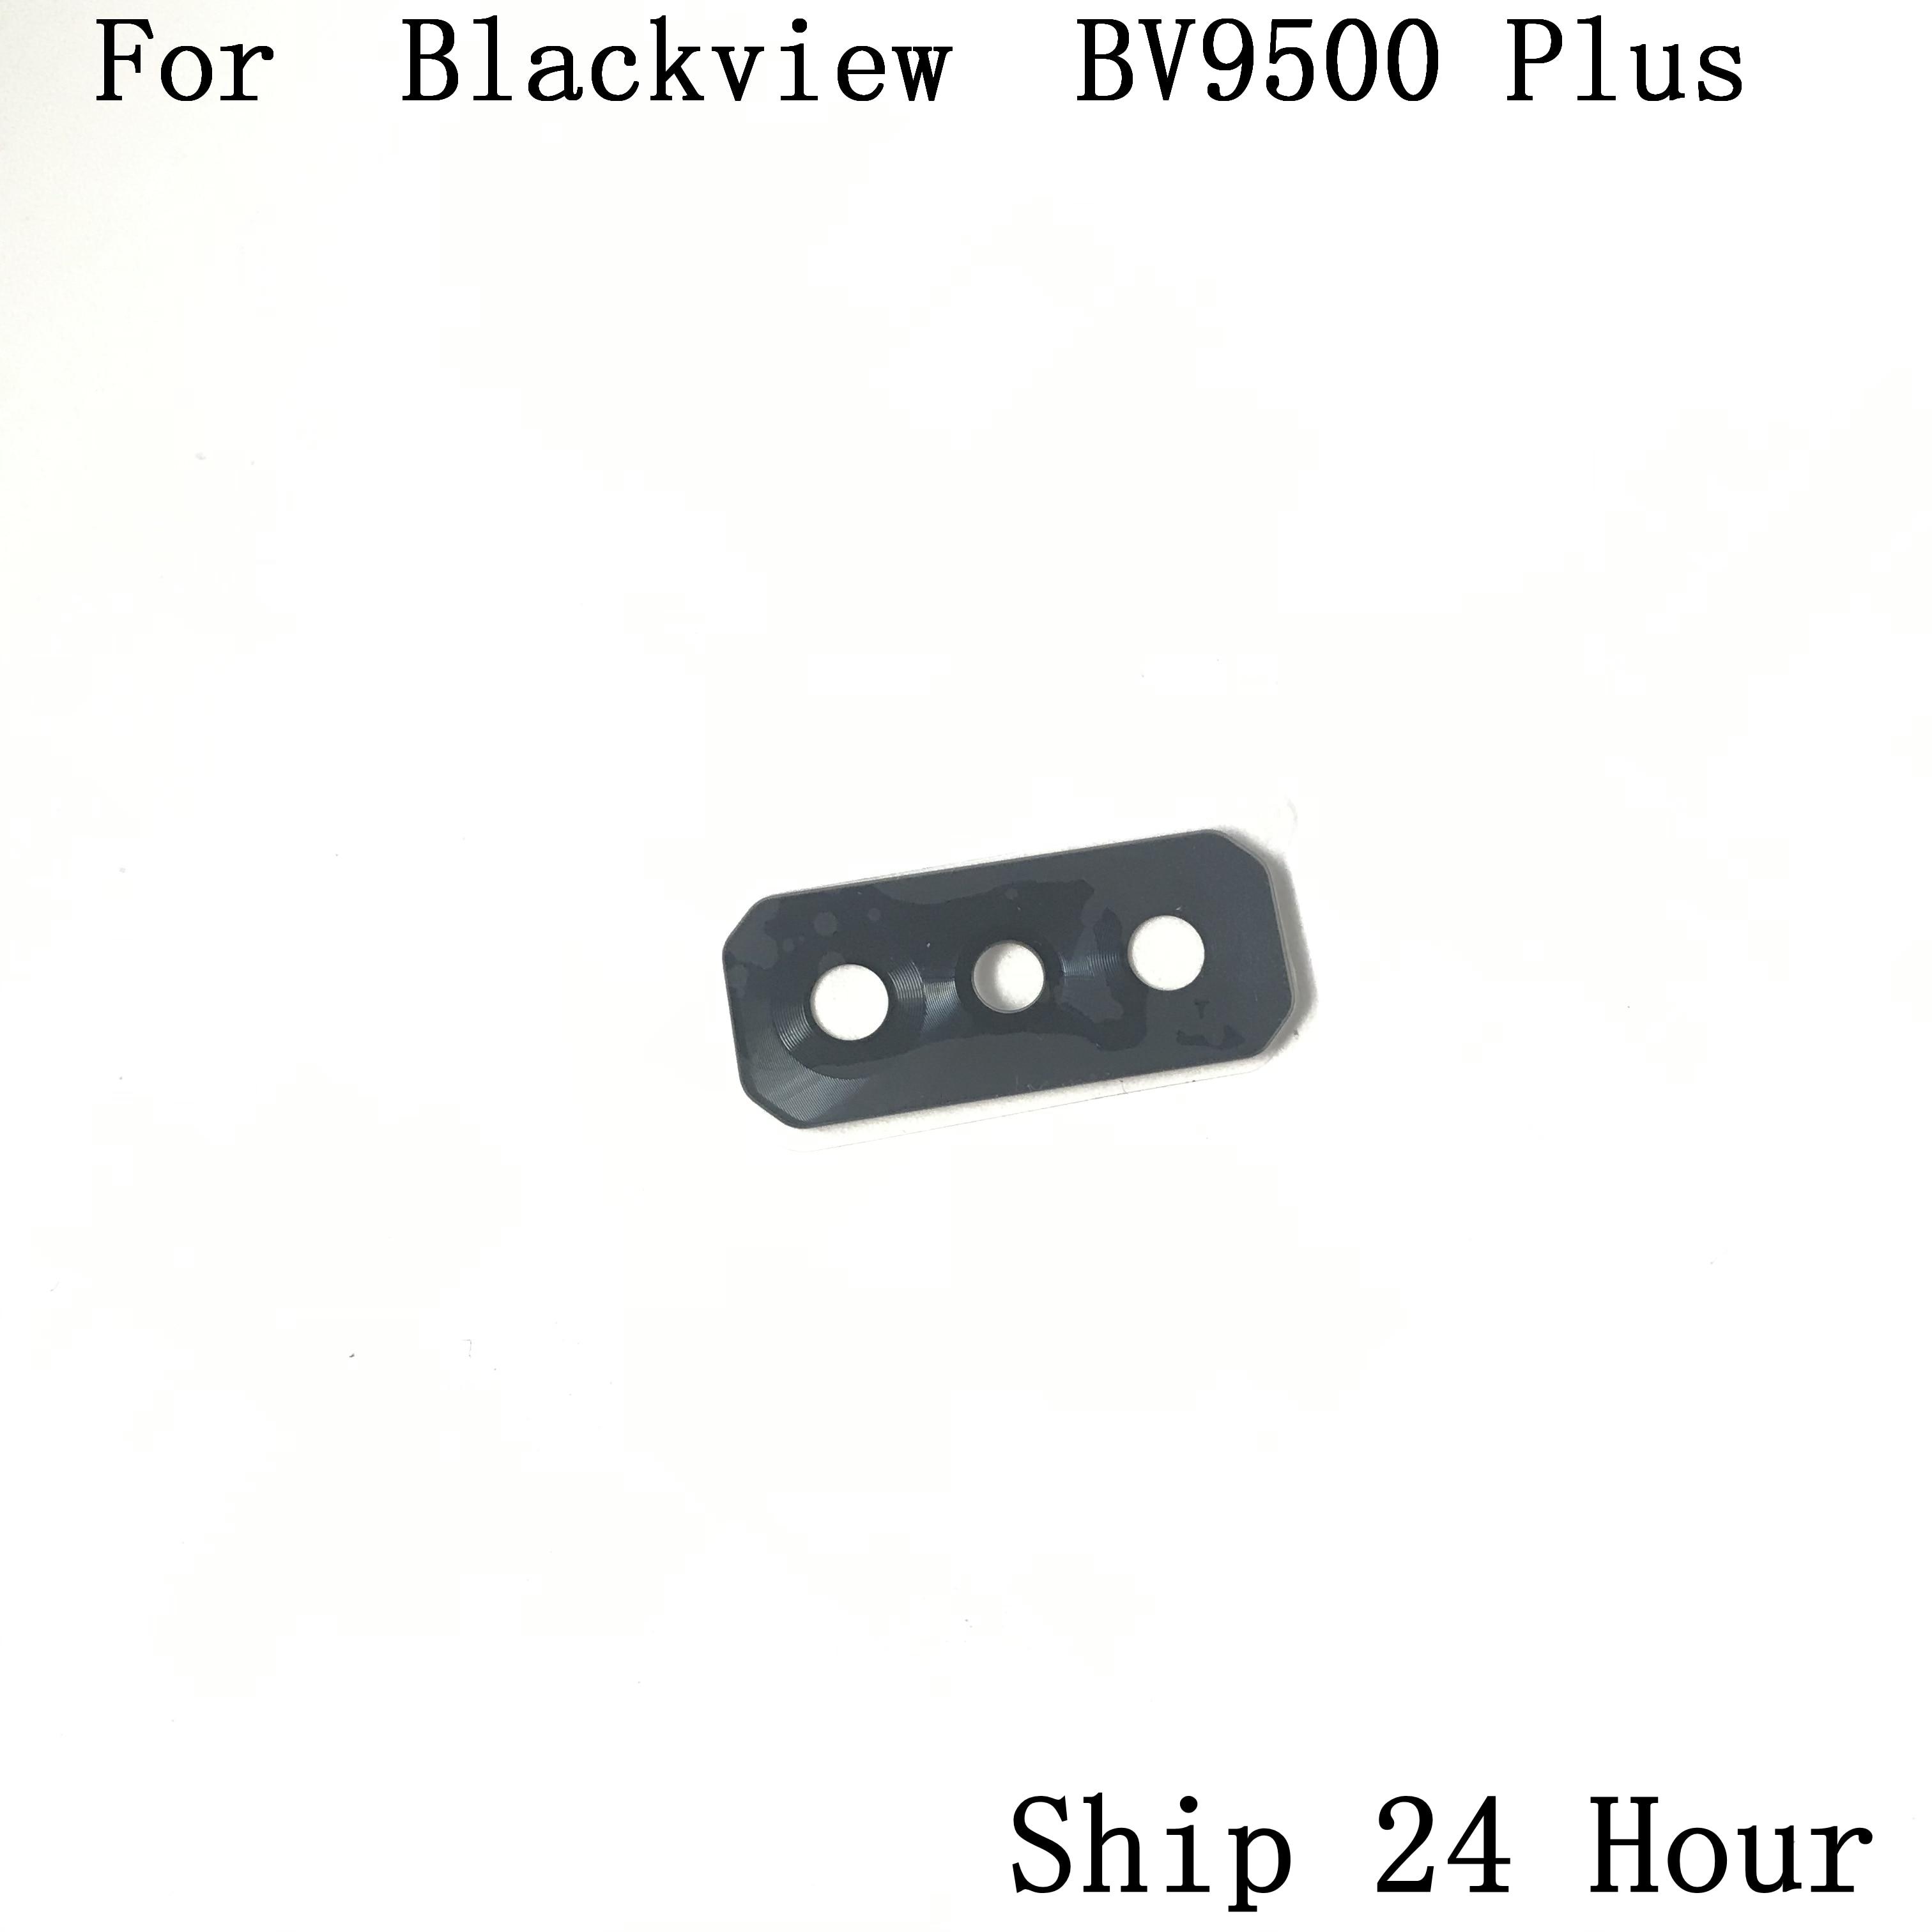 Blackview BV9500 Plus New Back Rear Camera Lens Glass Cover For Blackview BV9500 Plus Repair Fixing Part Replacement